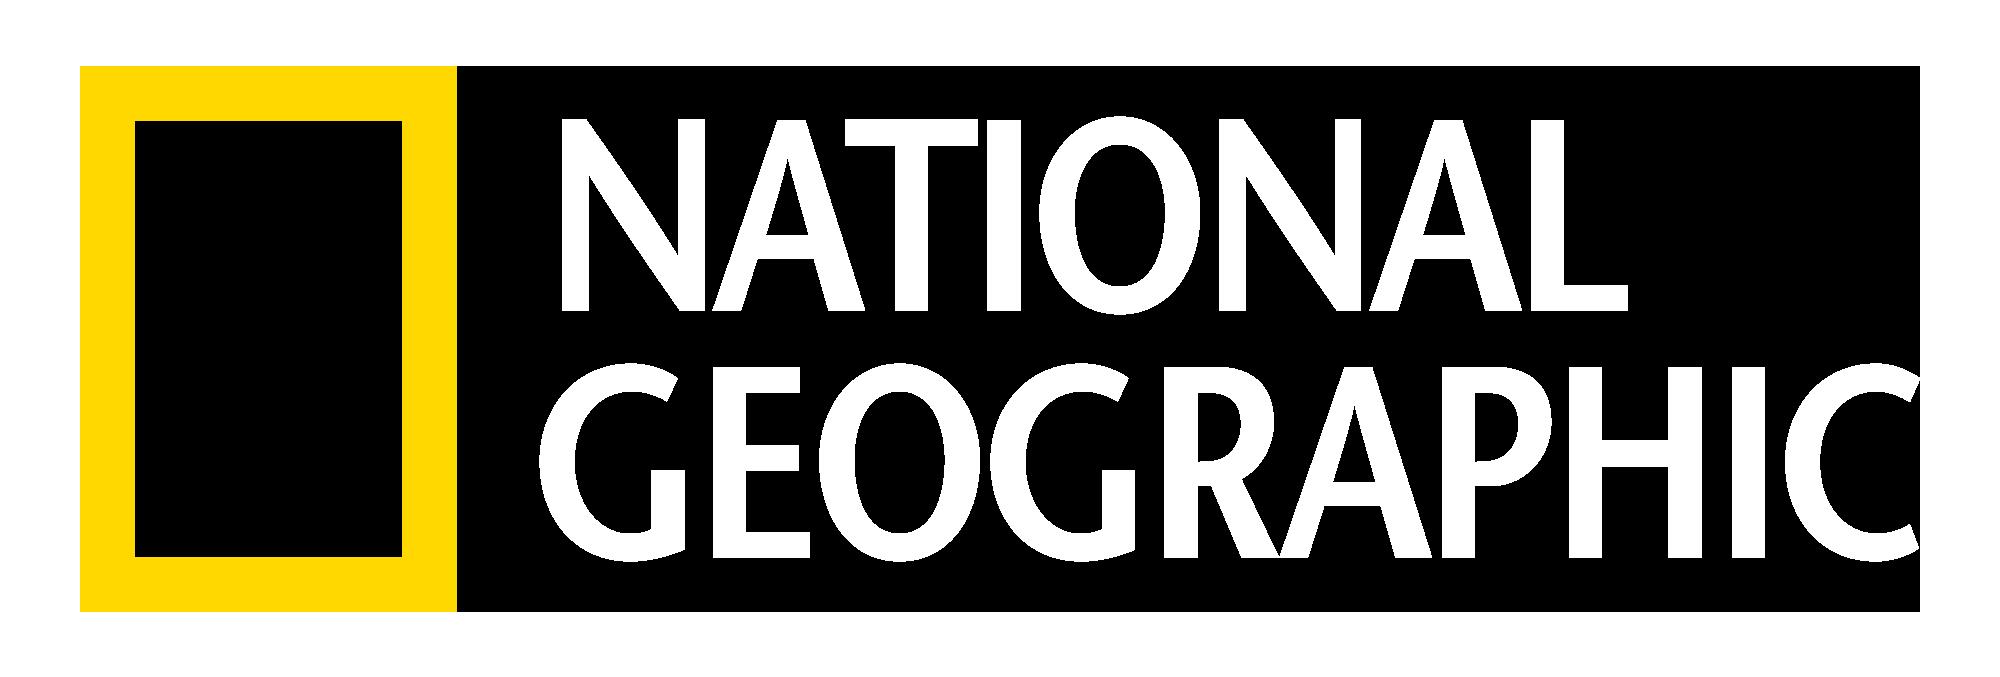 NG_LOGO_white.png - National Geographic Logo PNG